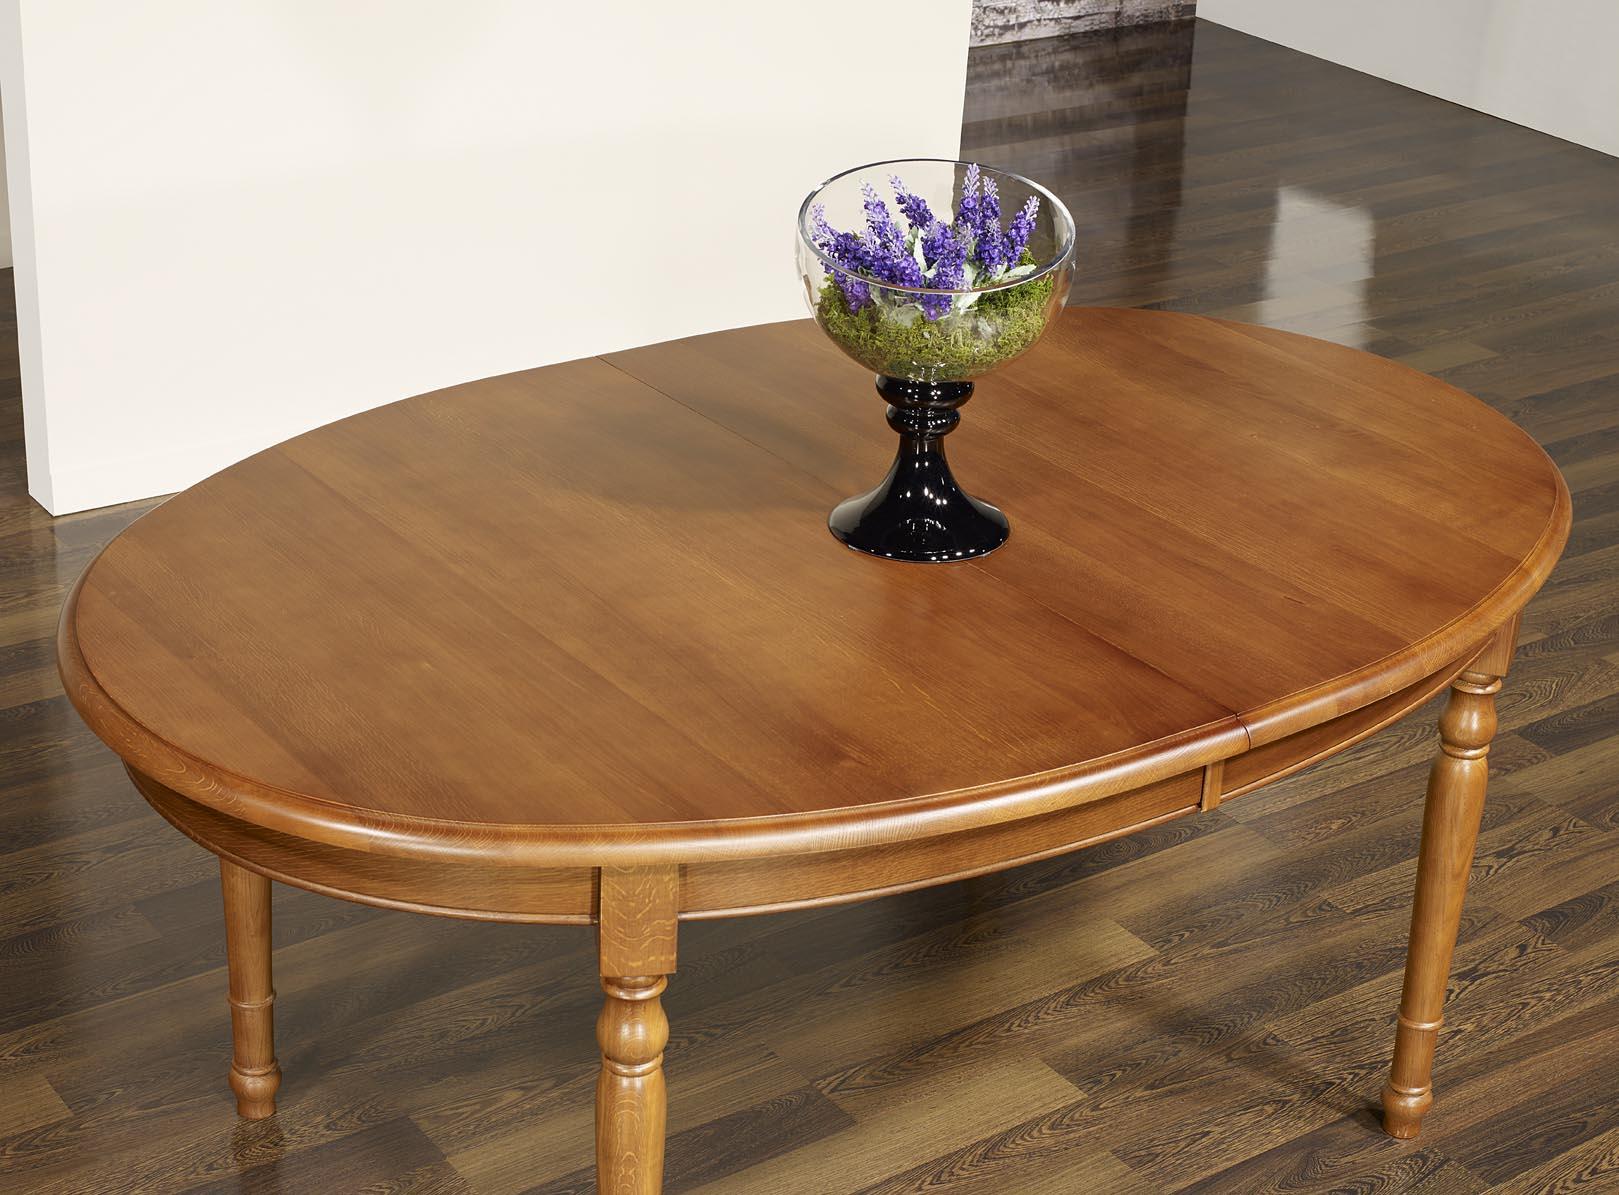 Table ovale 170x110 en ch ne massif de style louis for Table ovale 10 personnes